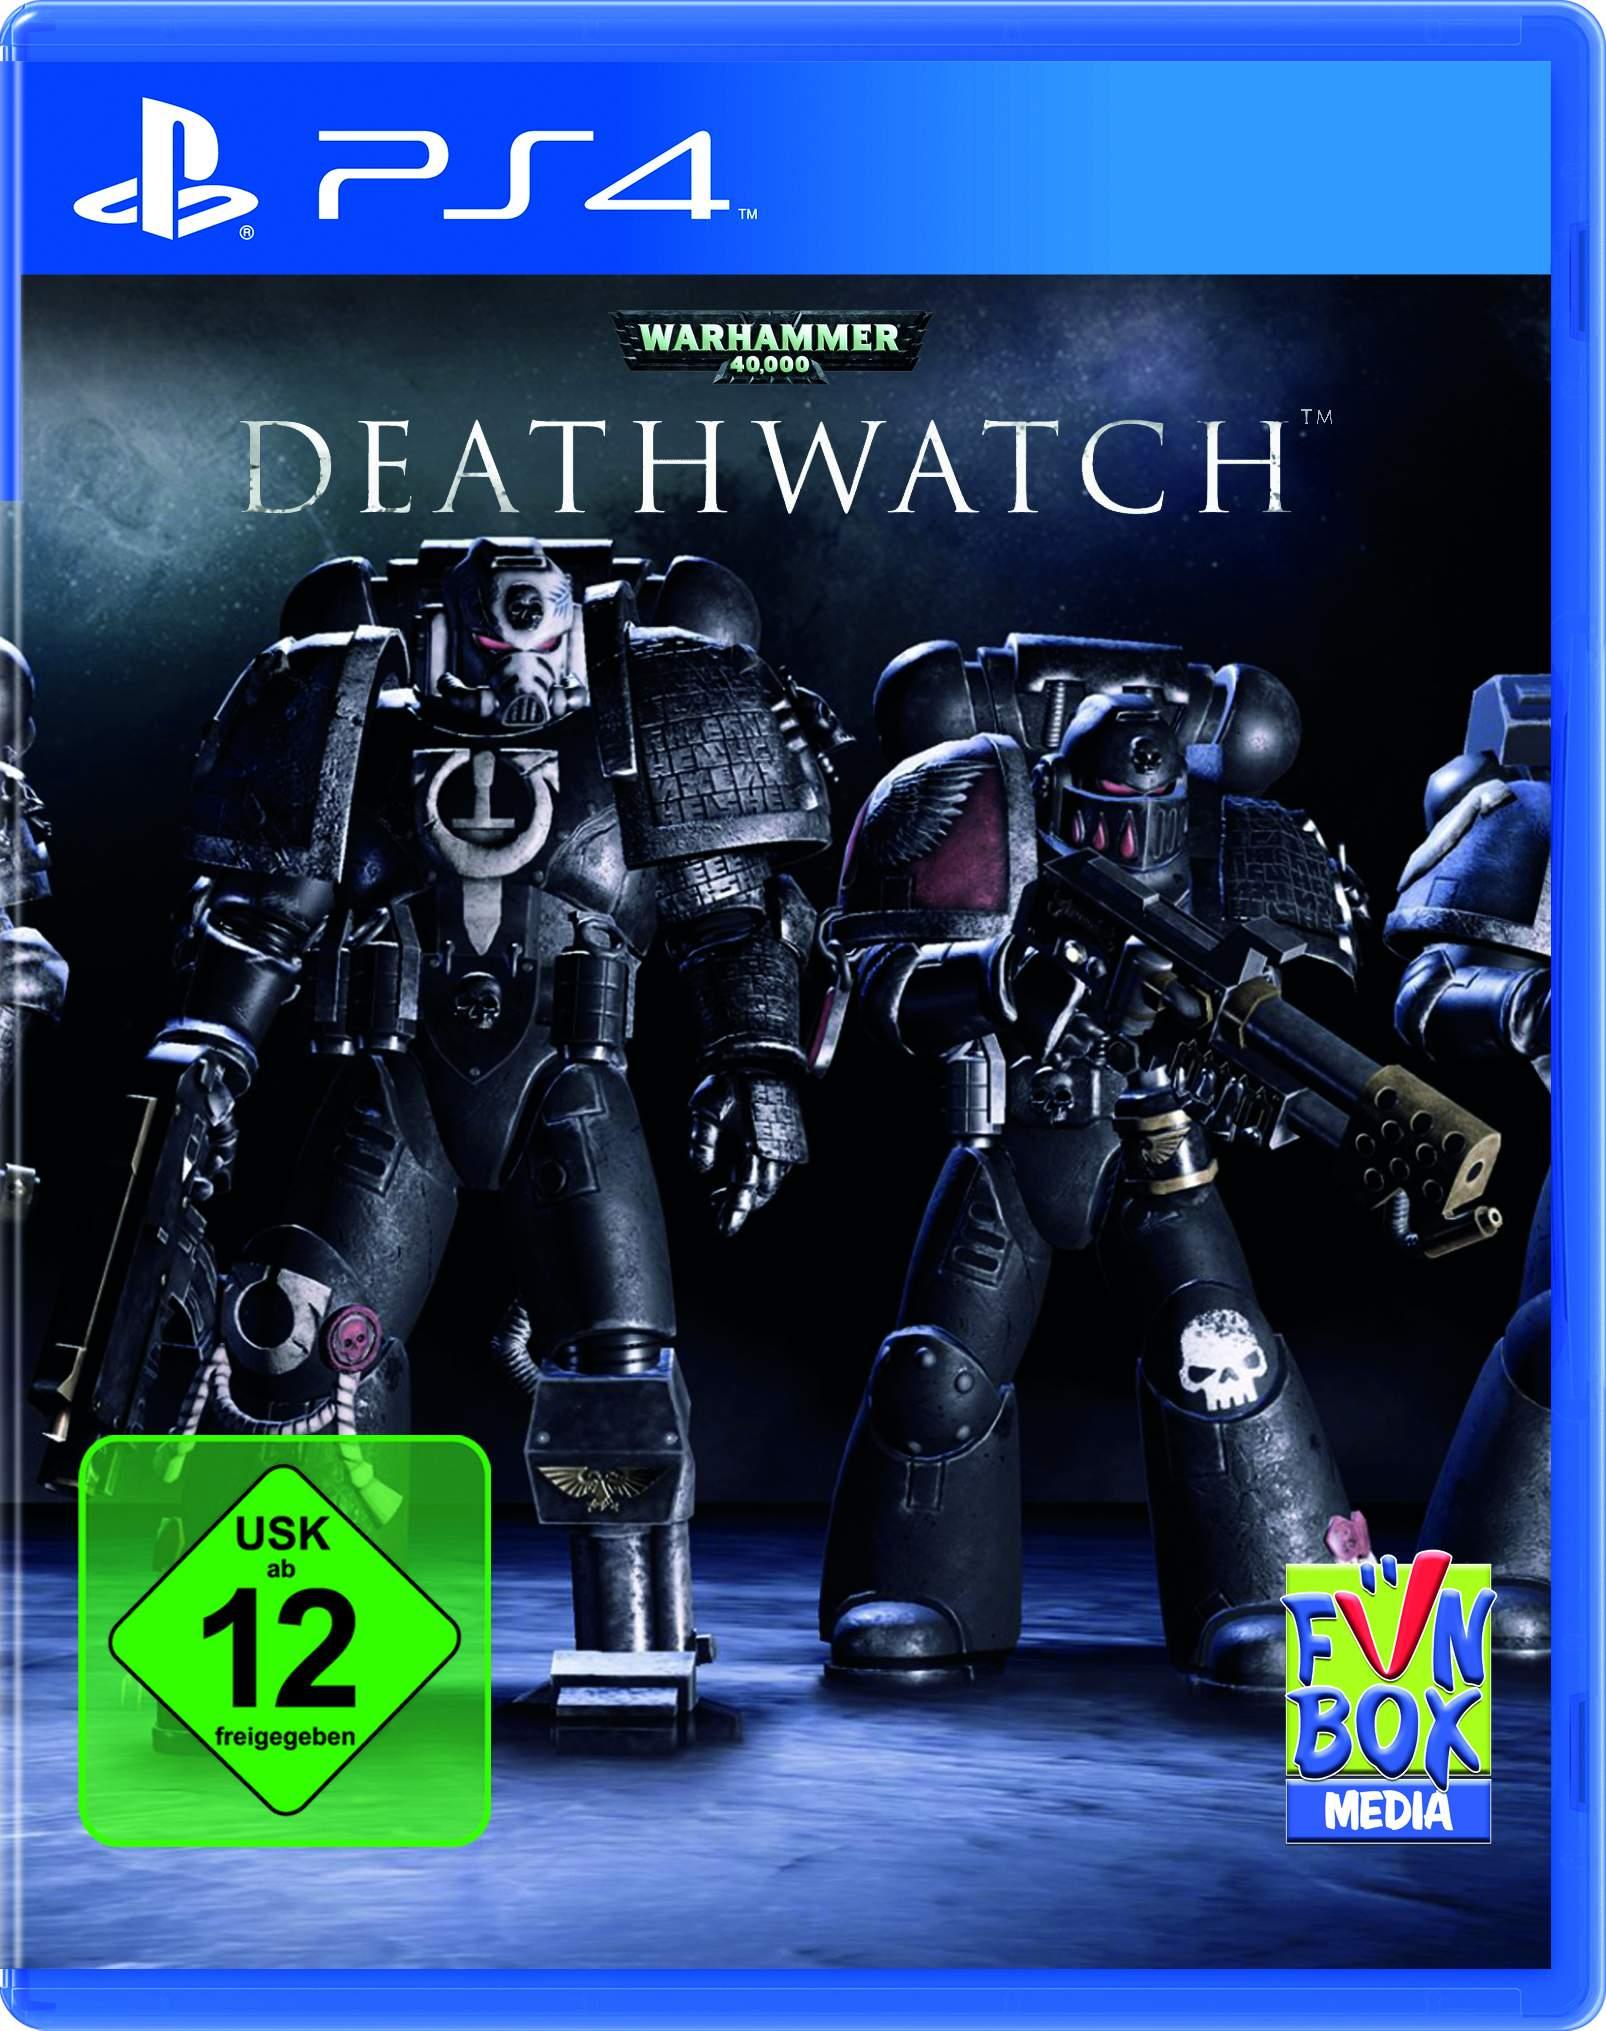 Warhammer40k Deathwatch PS4 USK Packshot